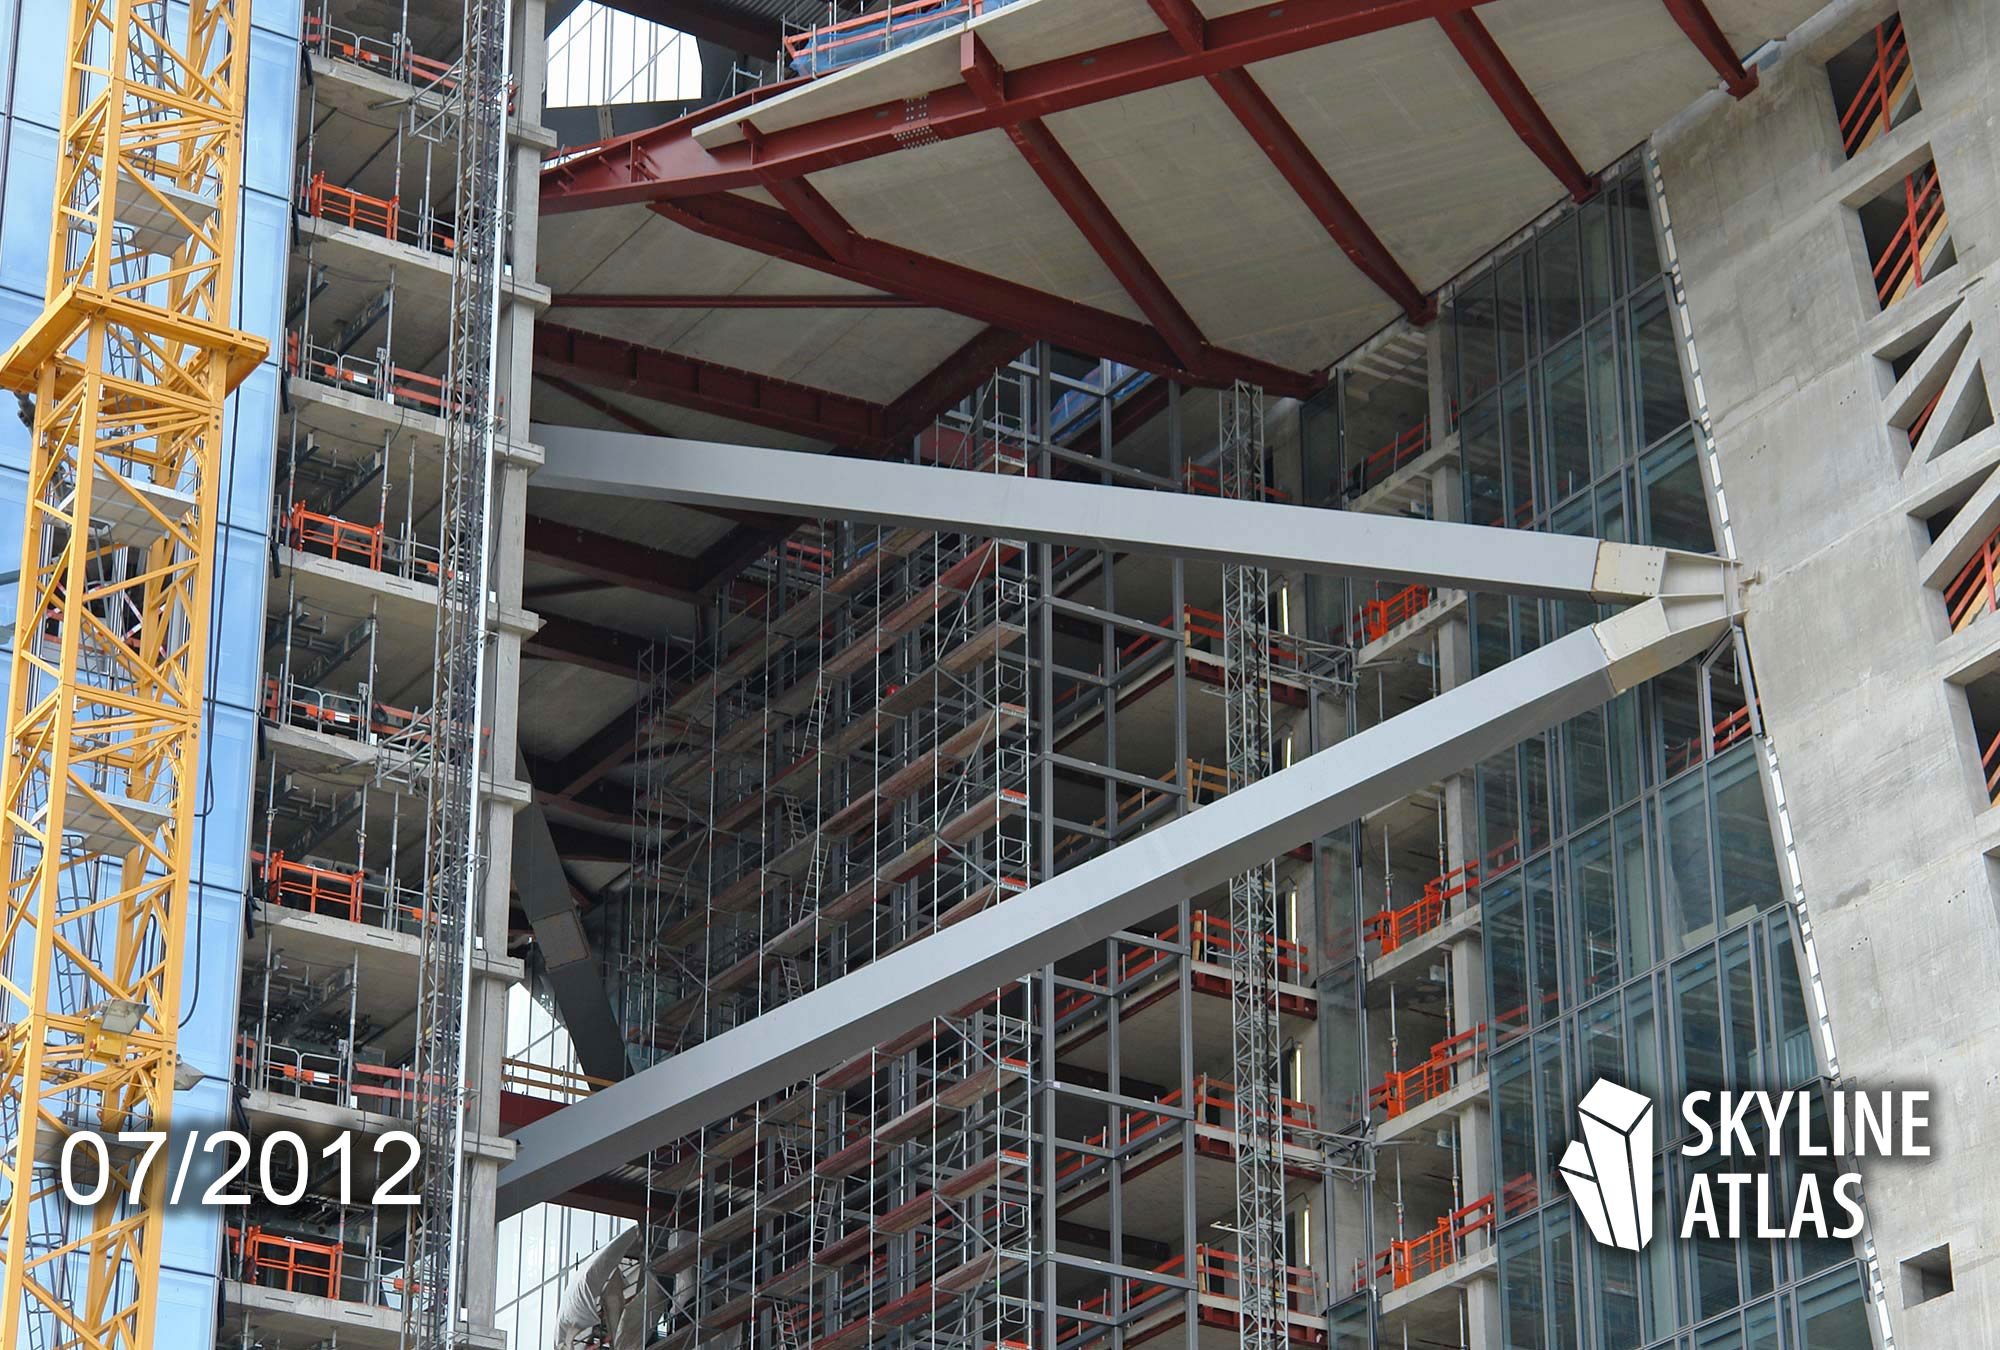 Stahlskelettkonstruktion am Hochhaus der EZB - Träger